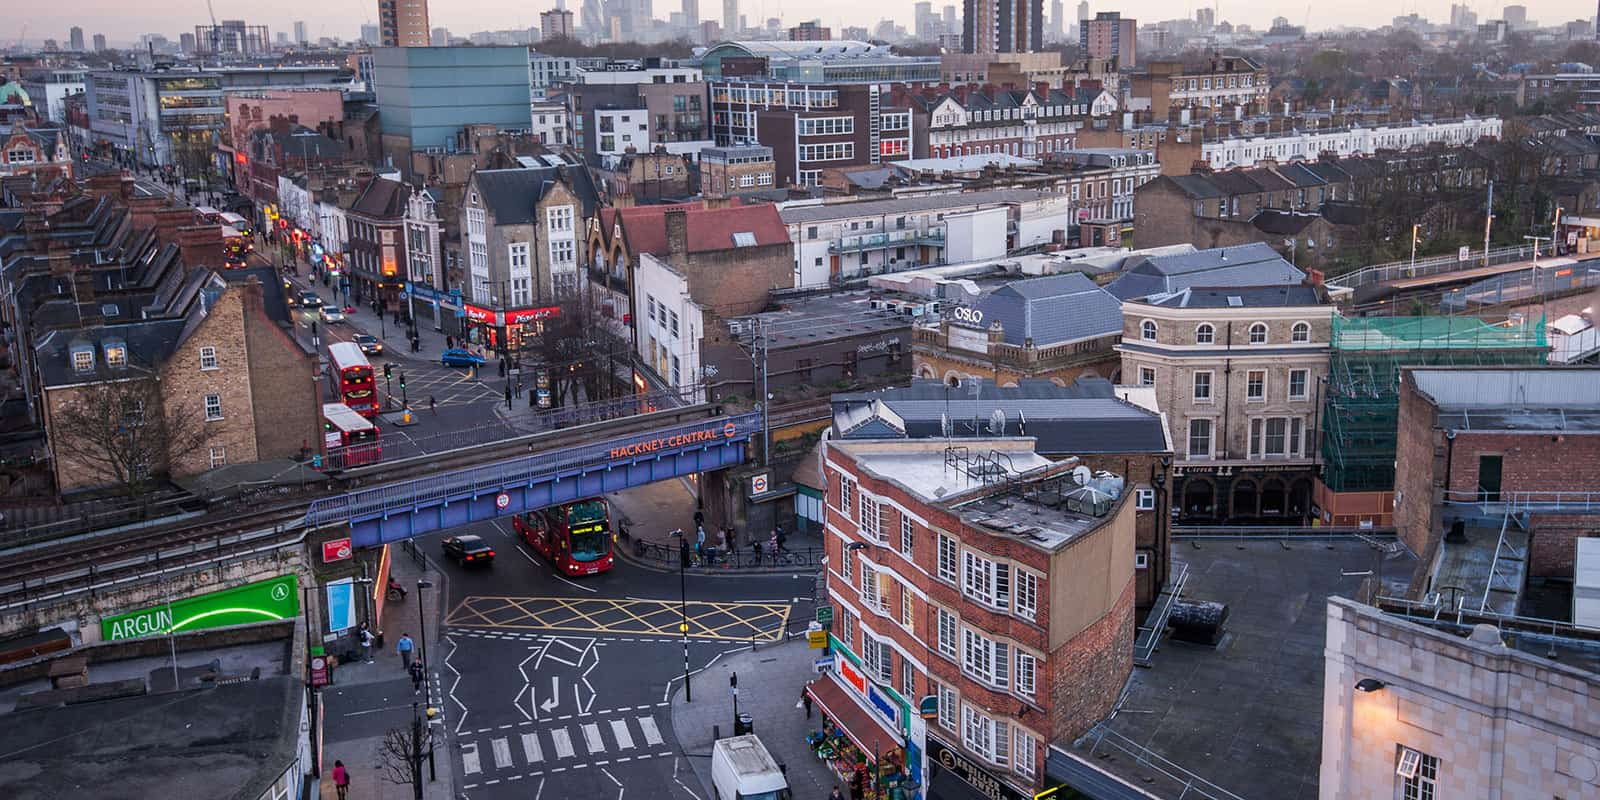 Hackaney London